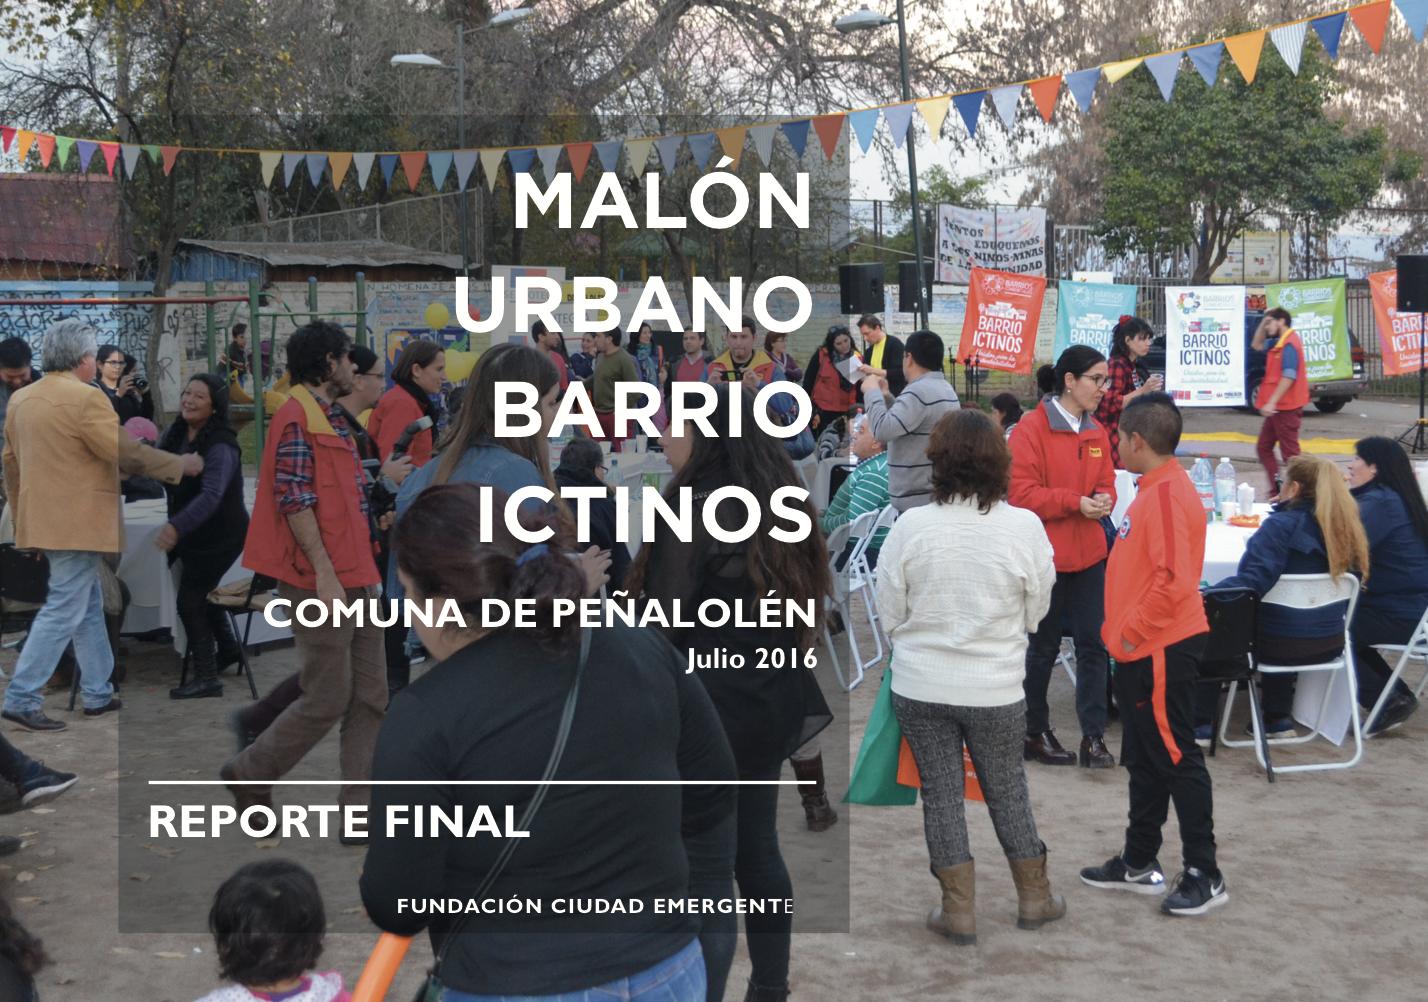 MALÓN URBANO BARRIO ICTINOS.png